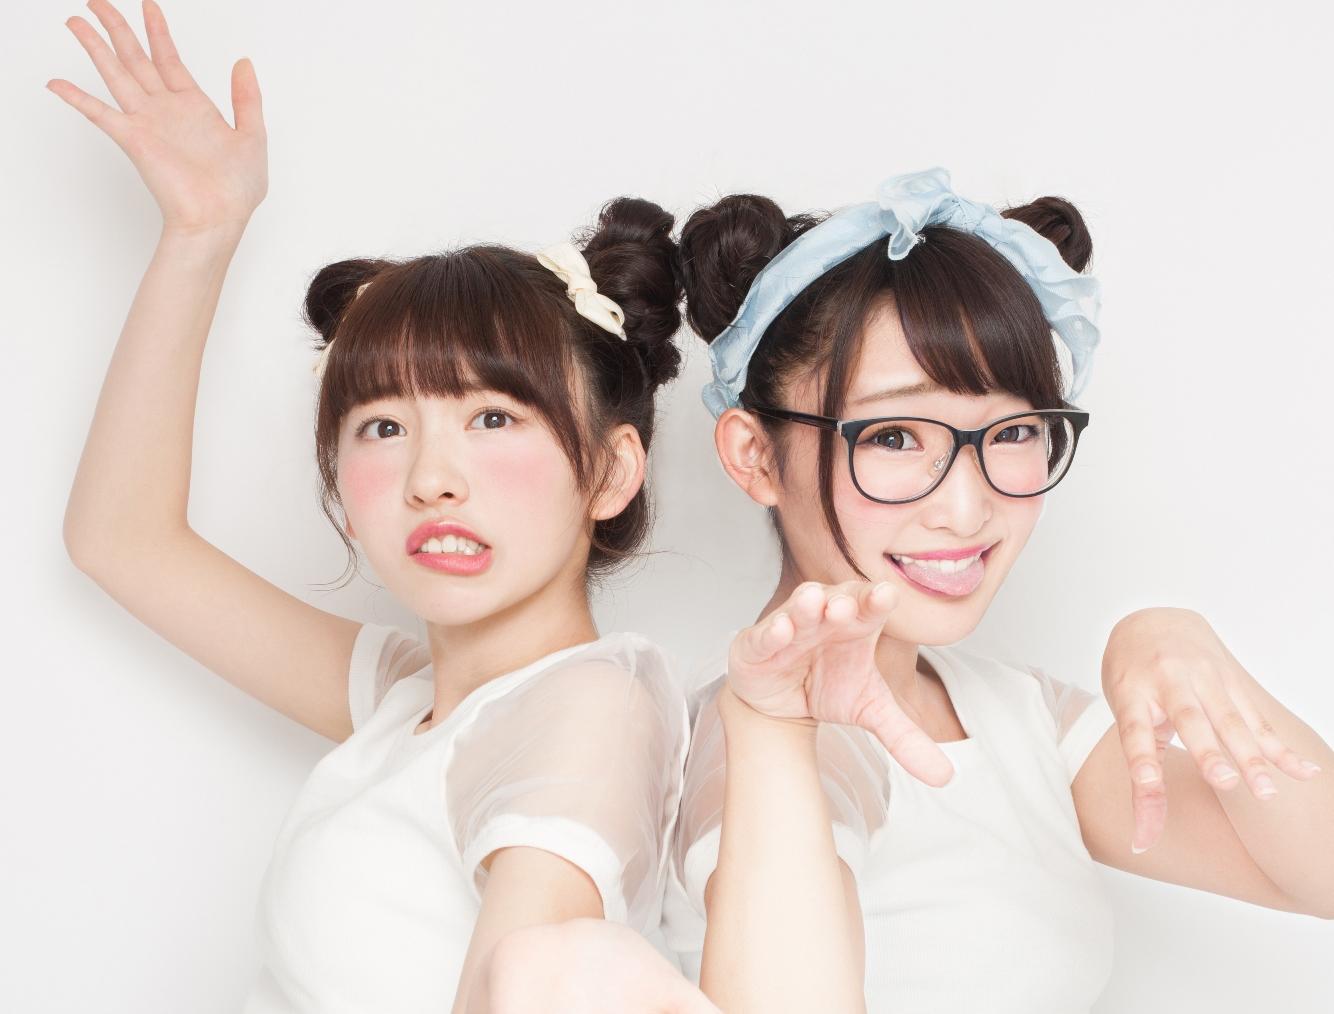 http://c.okmusic.jp/news_images/images/959268/original.jpg?1449199046